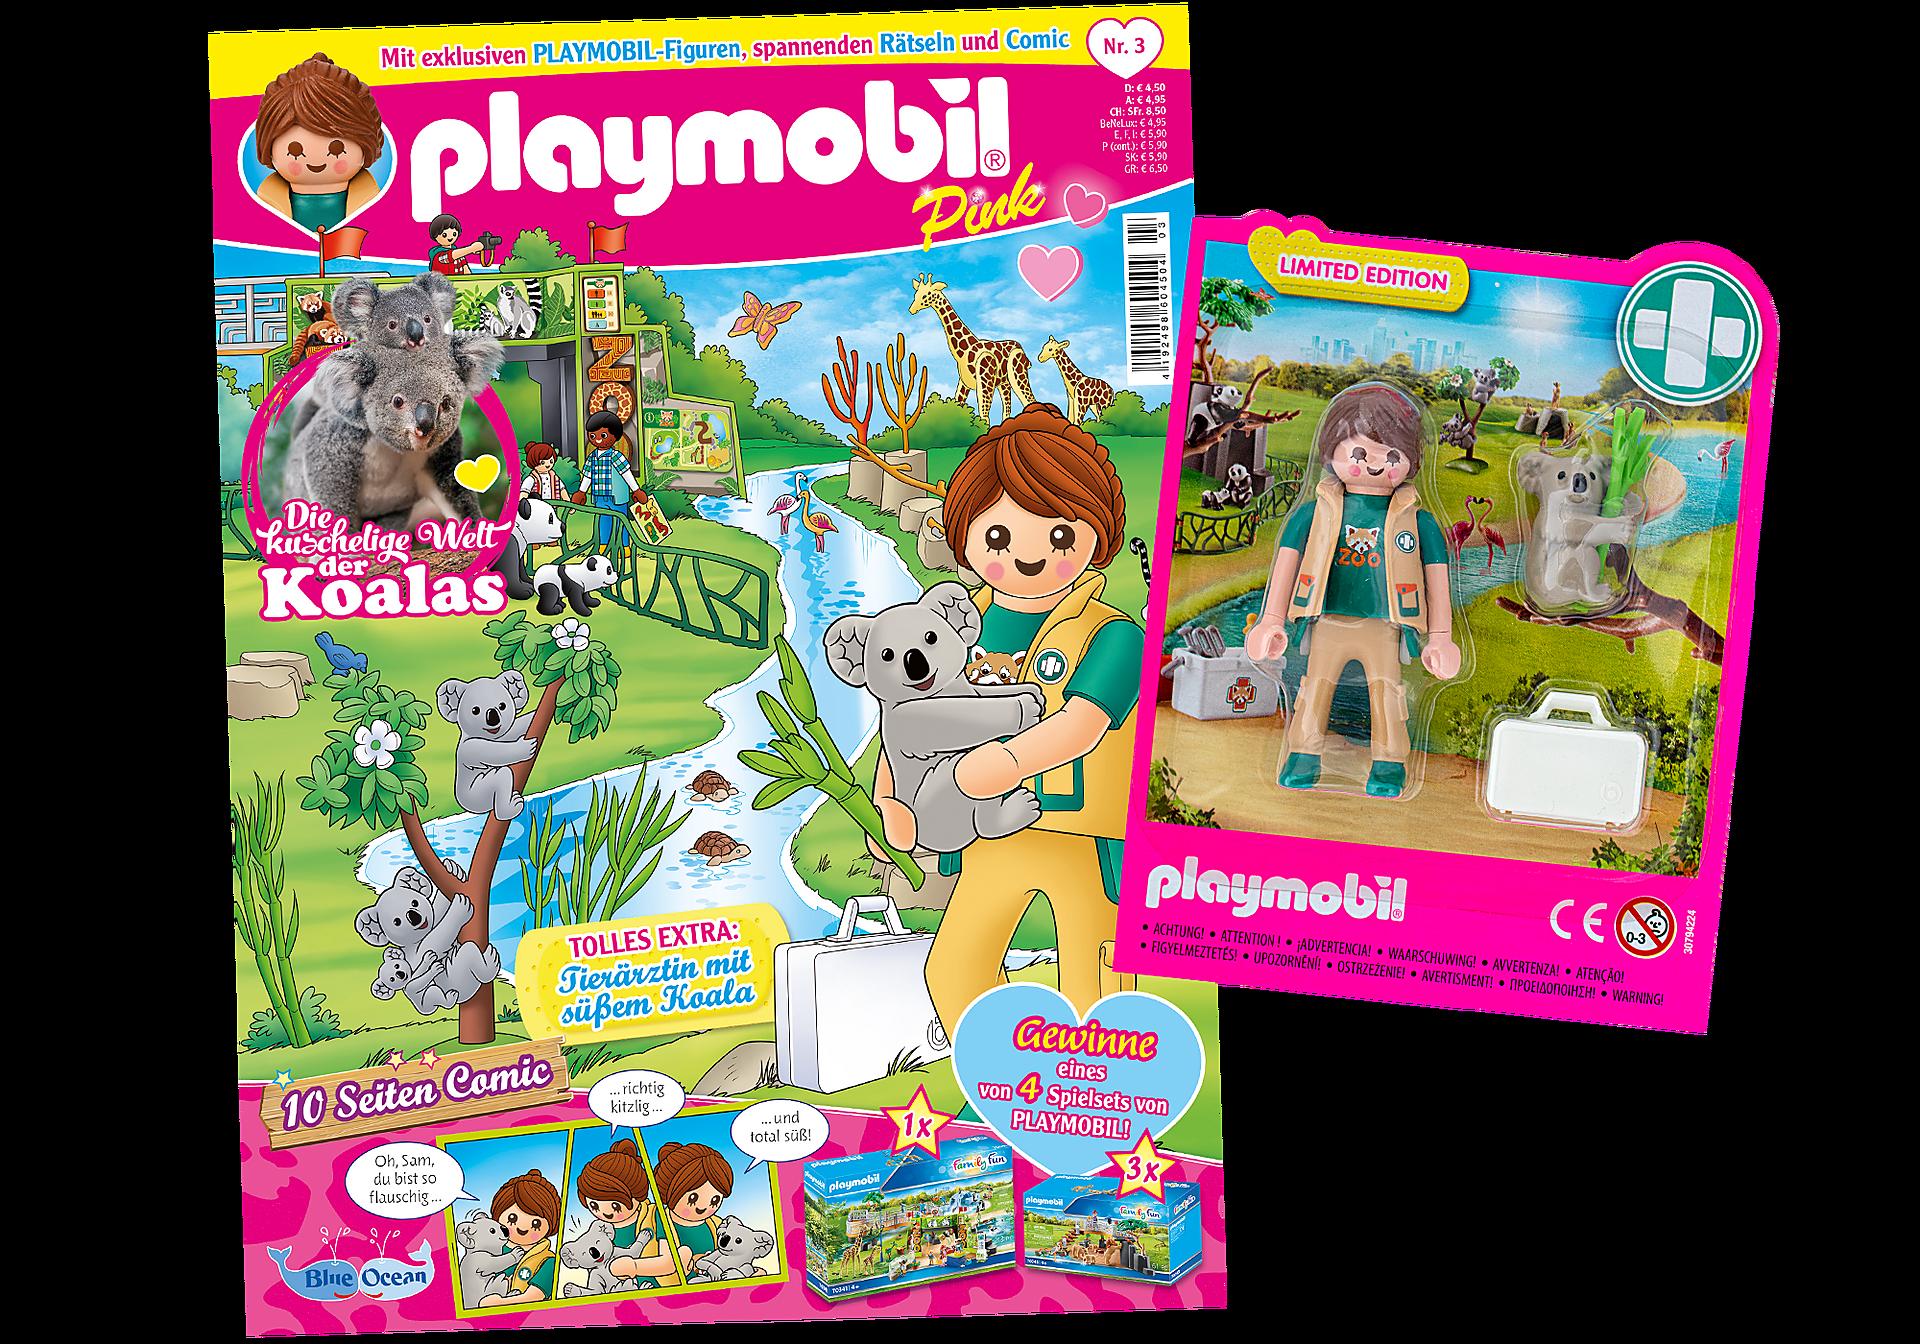 80656 PLAYMOBIL-Magazin Pink 3/2020 (Heft 52) zoom image1